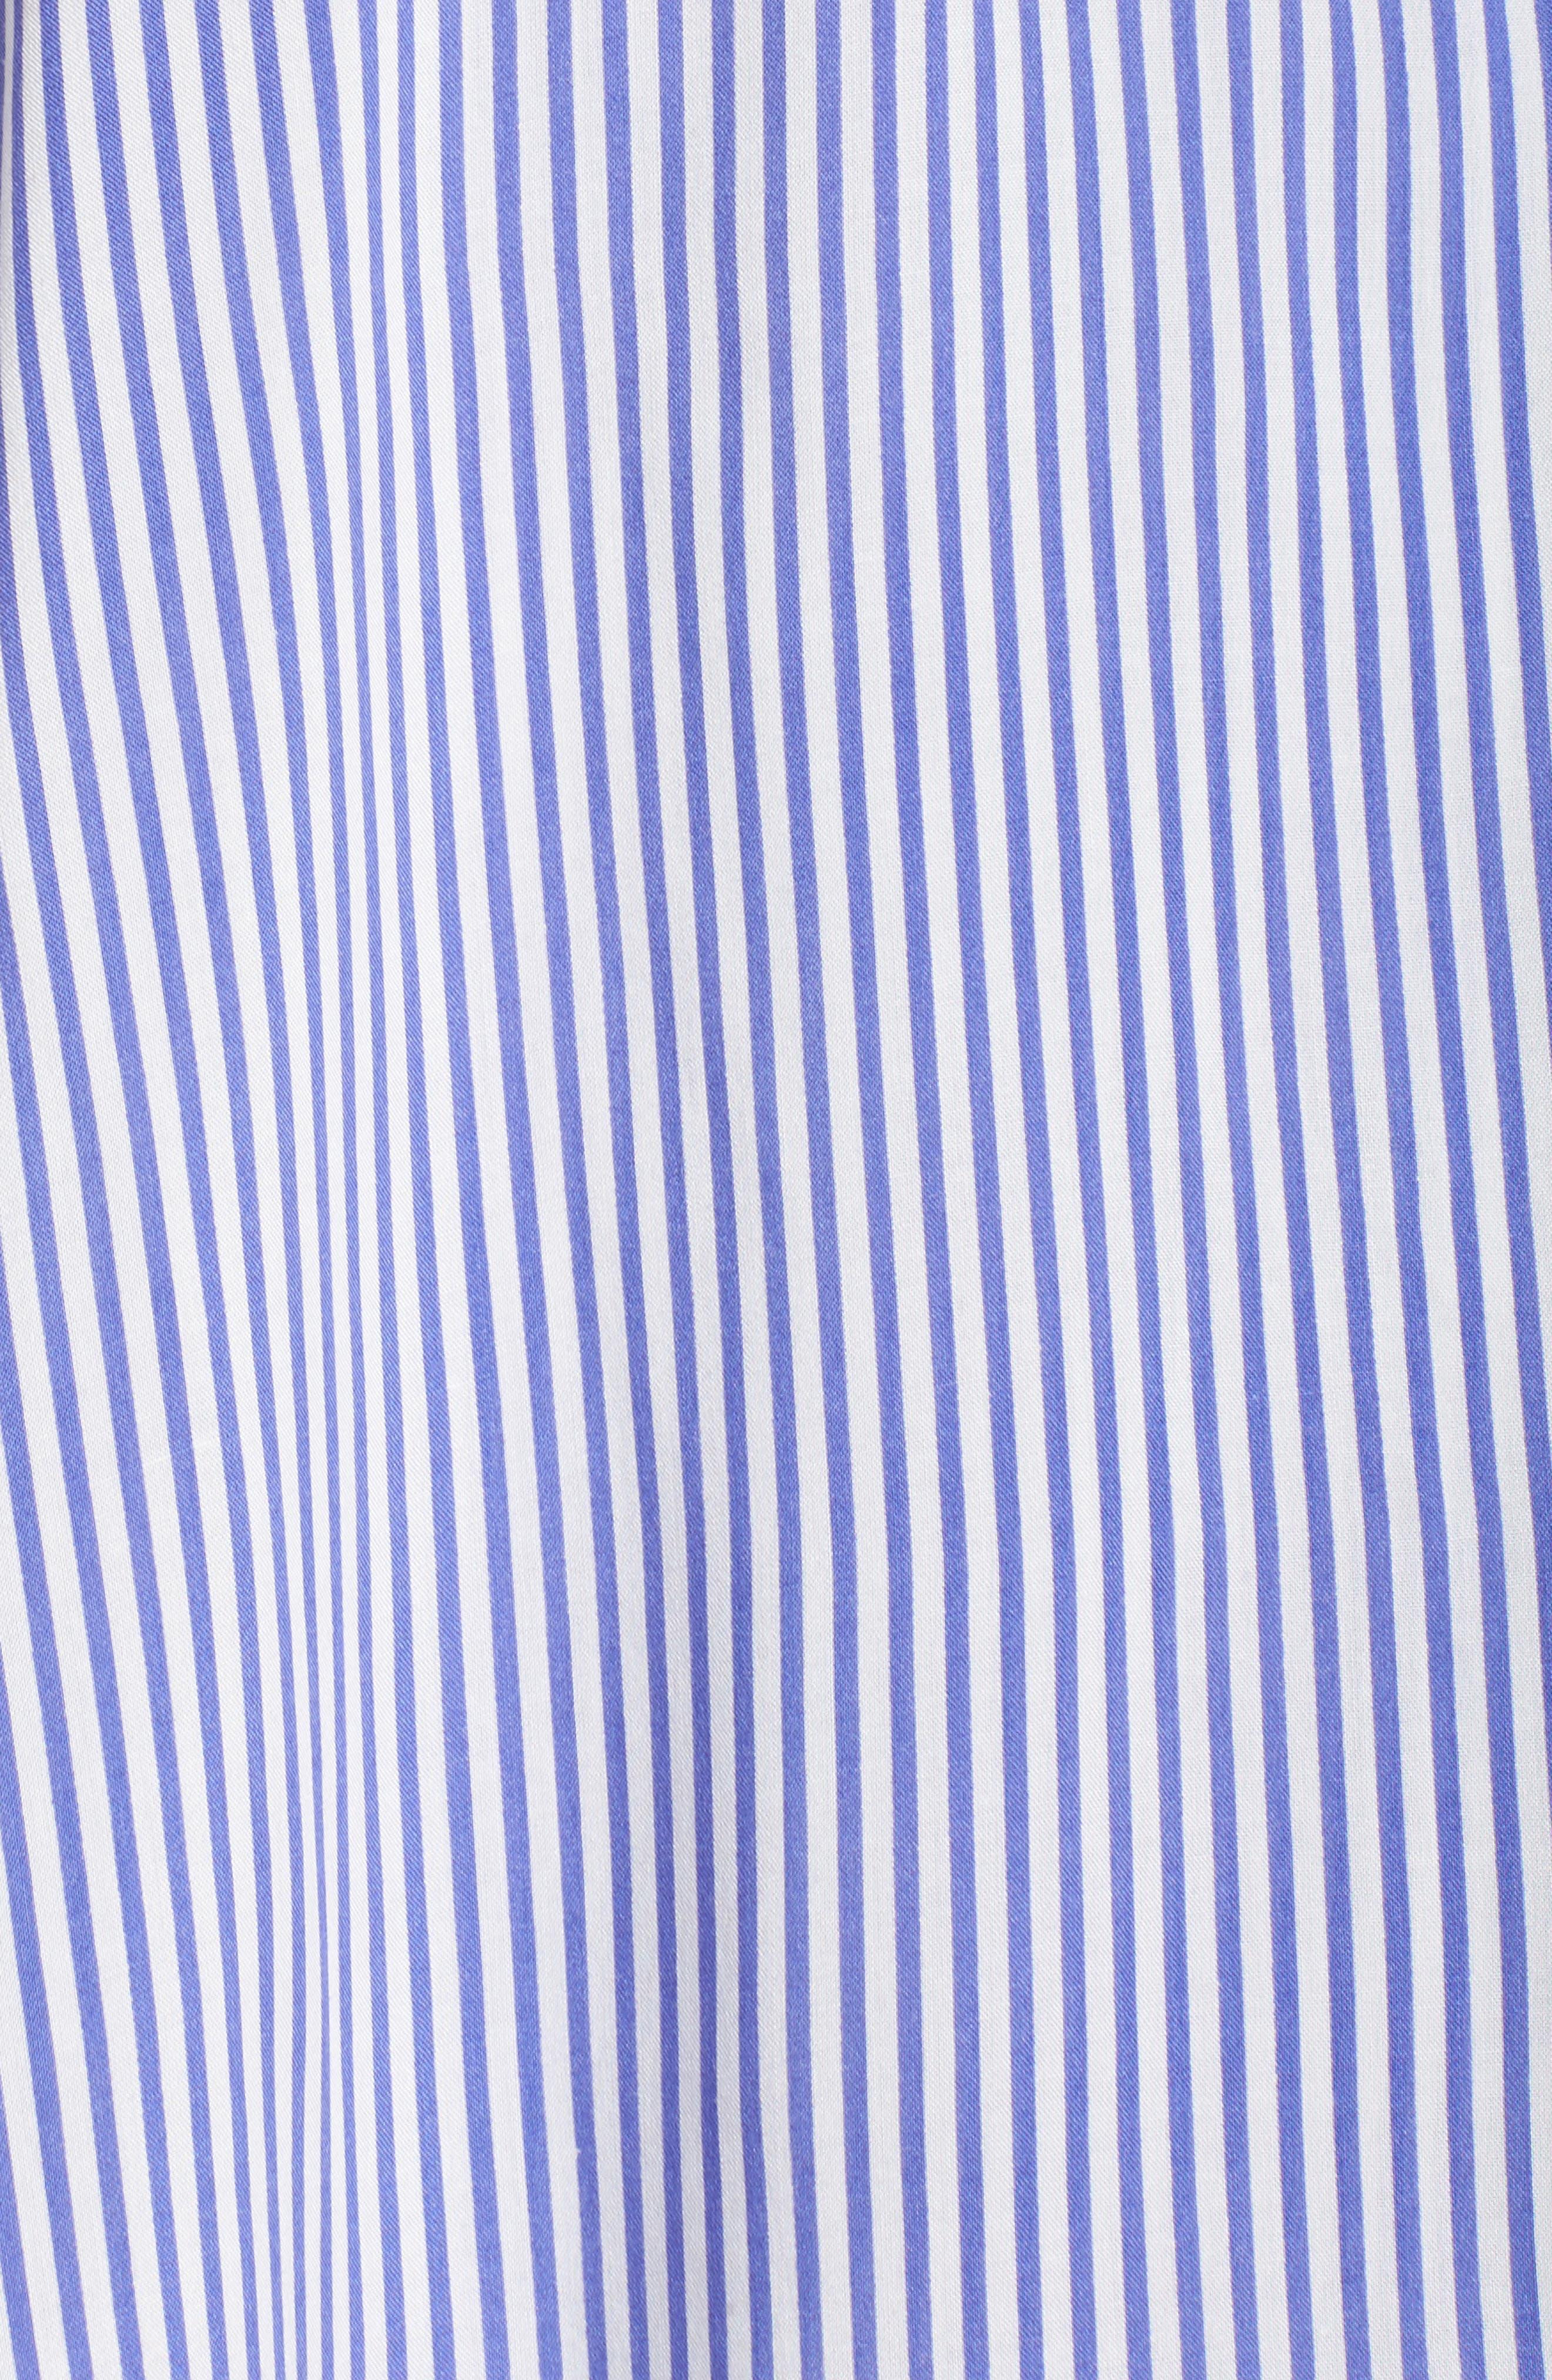 Stripe Ruffle Maxi Dress,                             Alternate thumbnail 6, color,